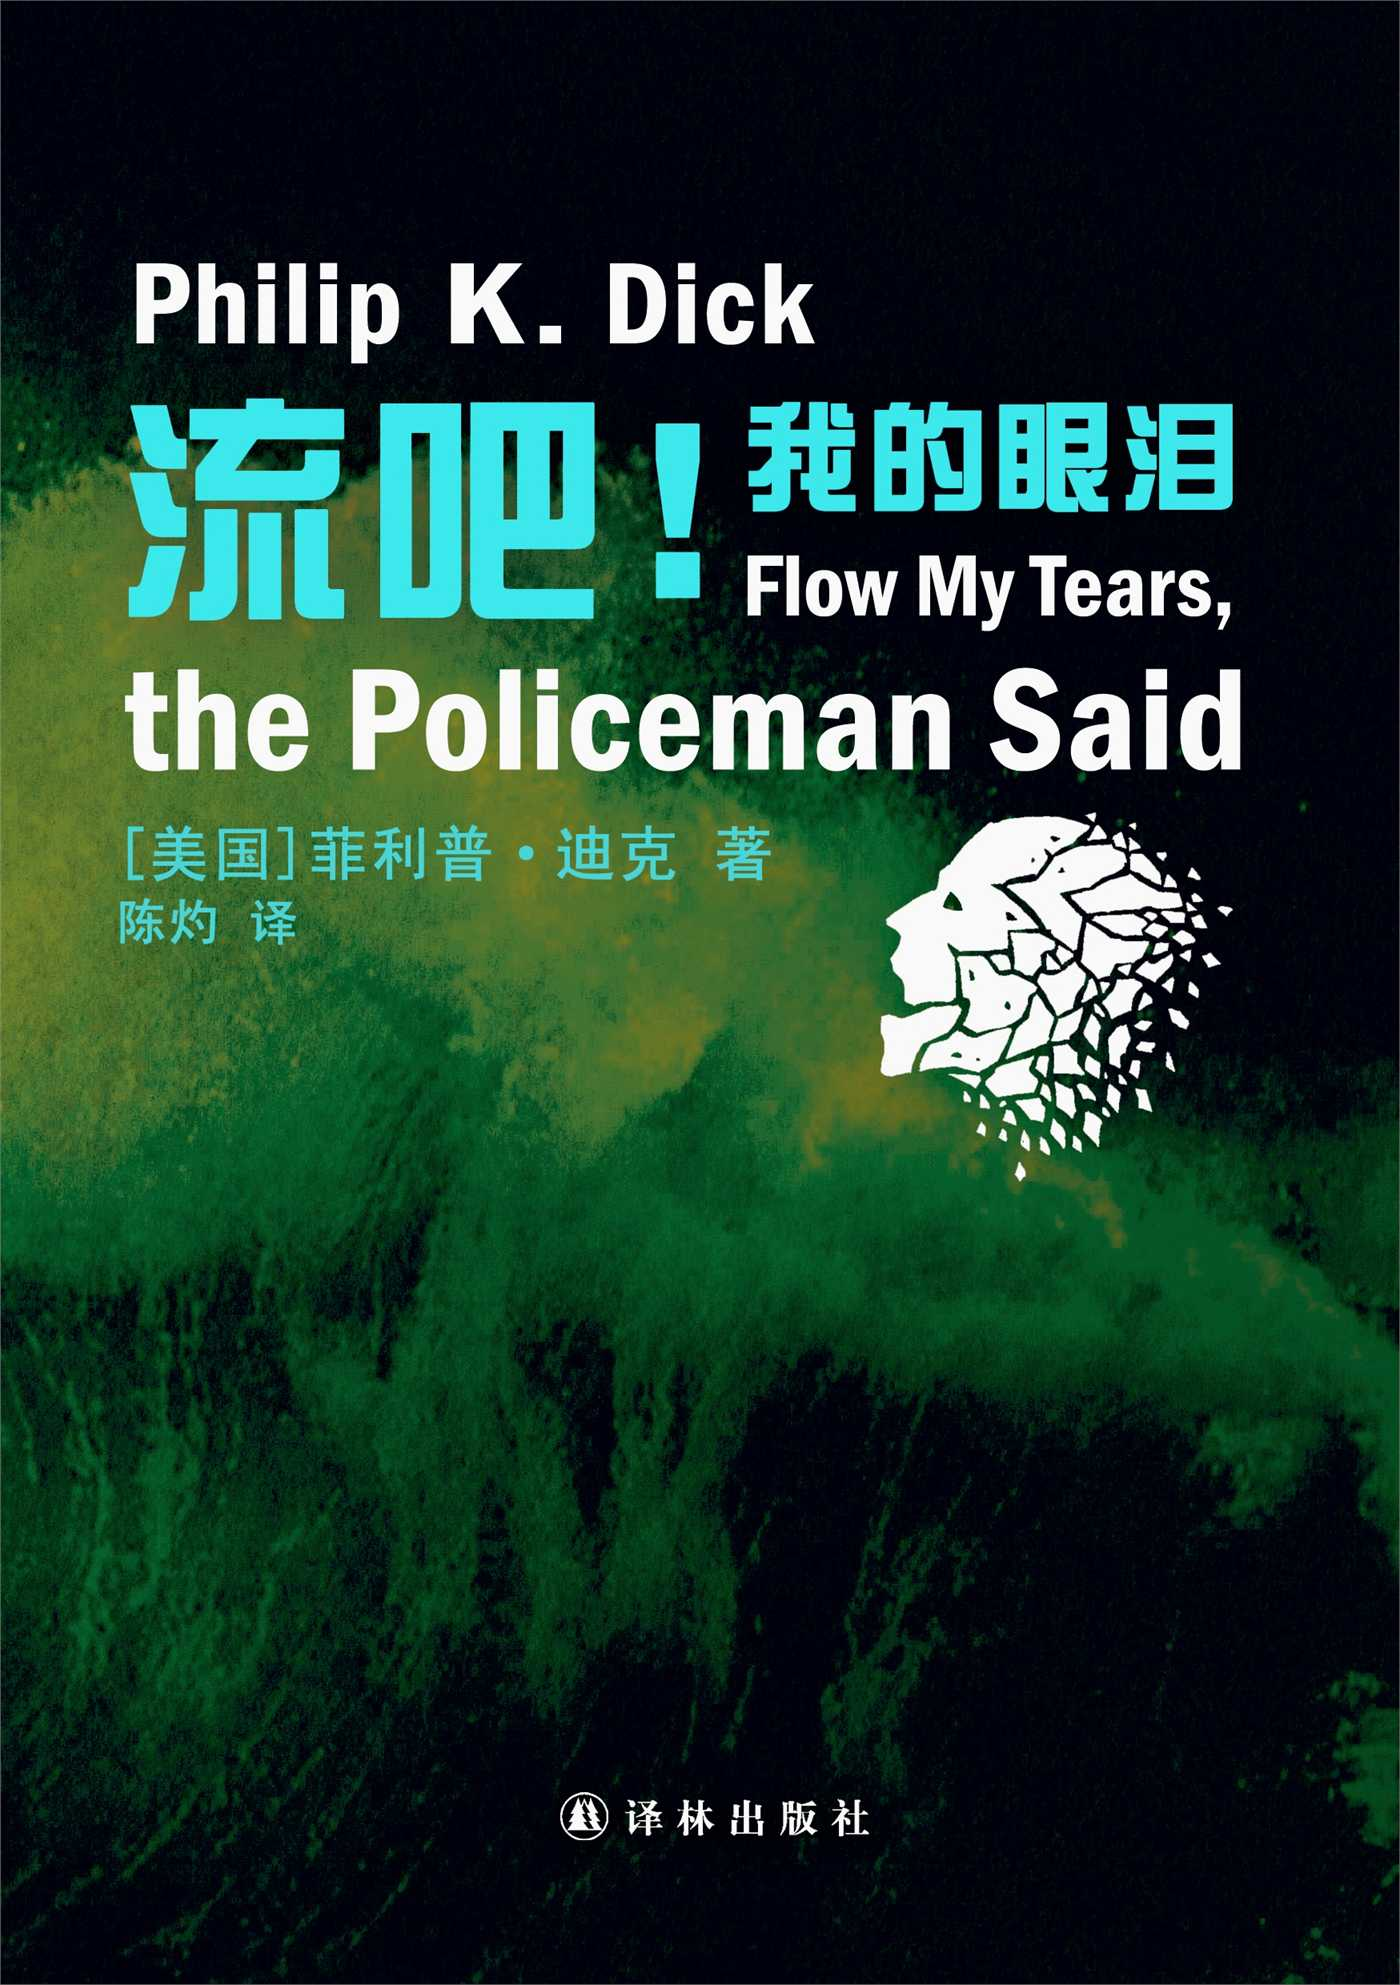 Philip K Dick and Amphetamines r/printSF - reddit